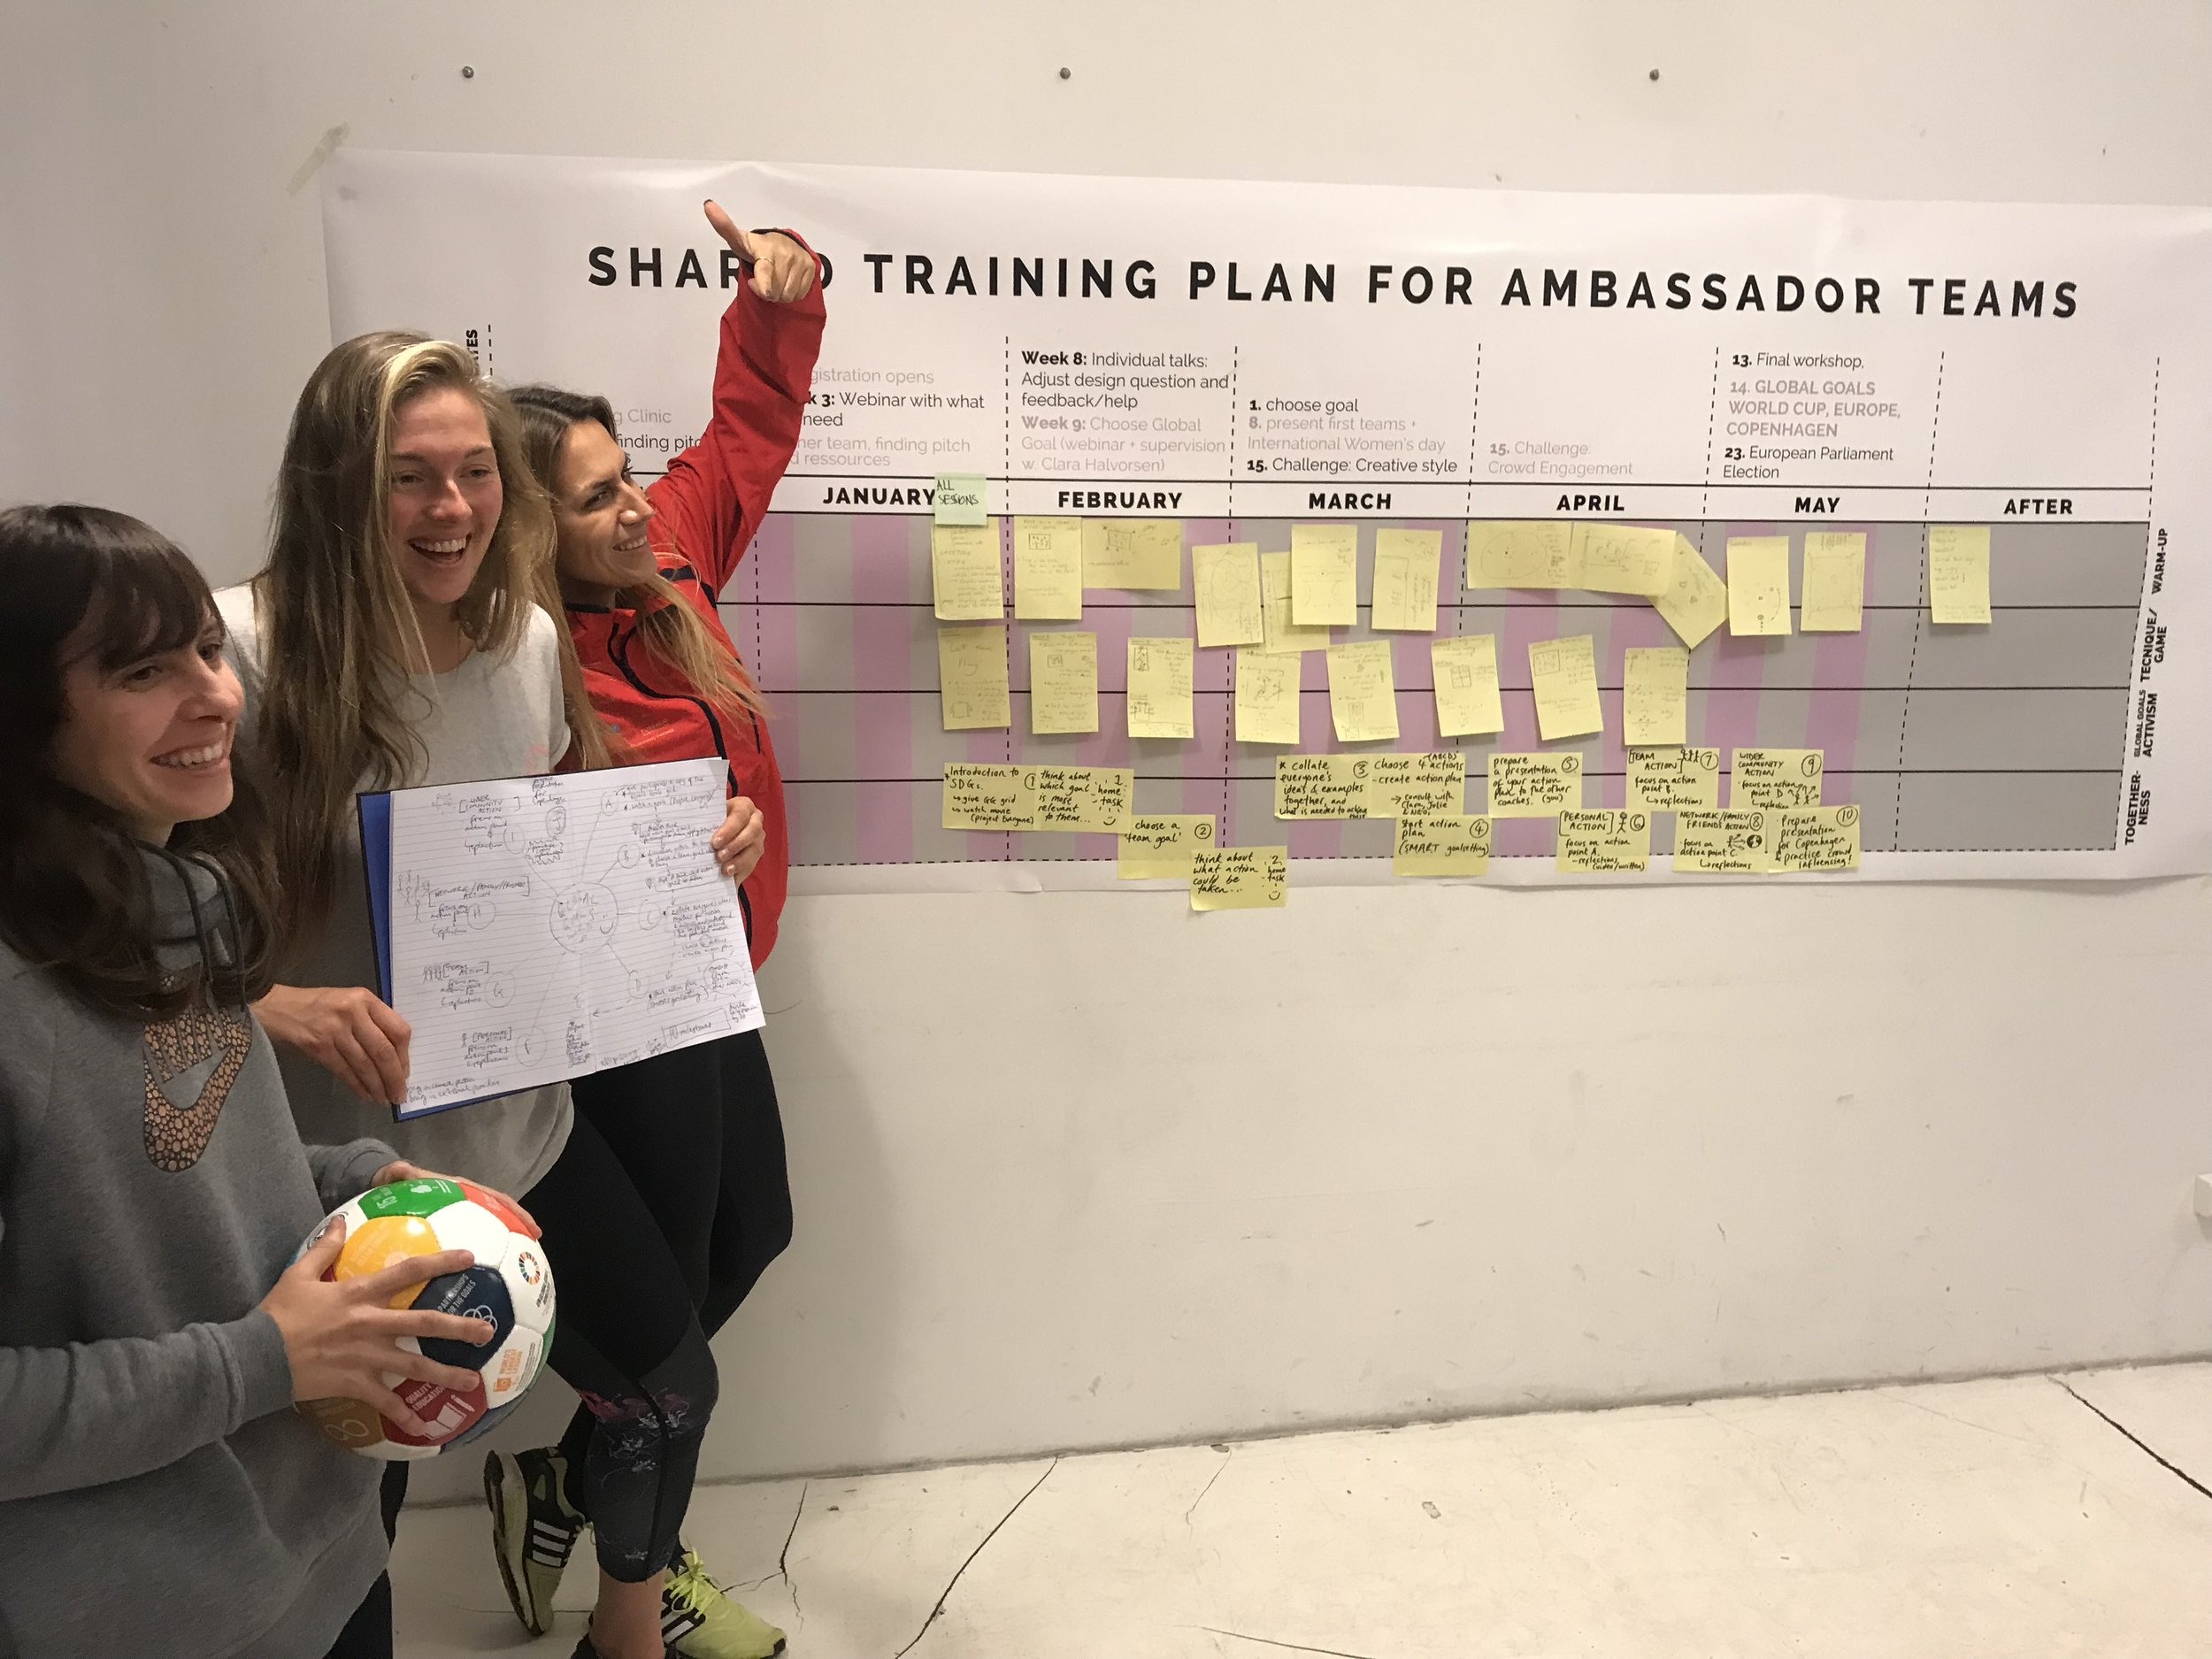 Developing shared training plan